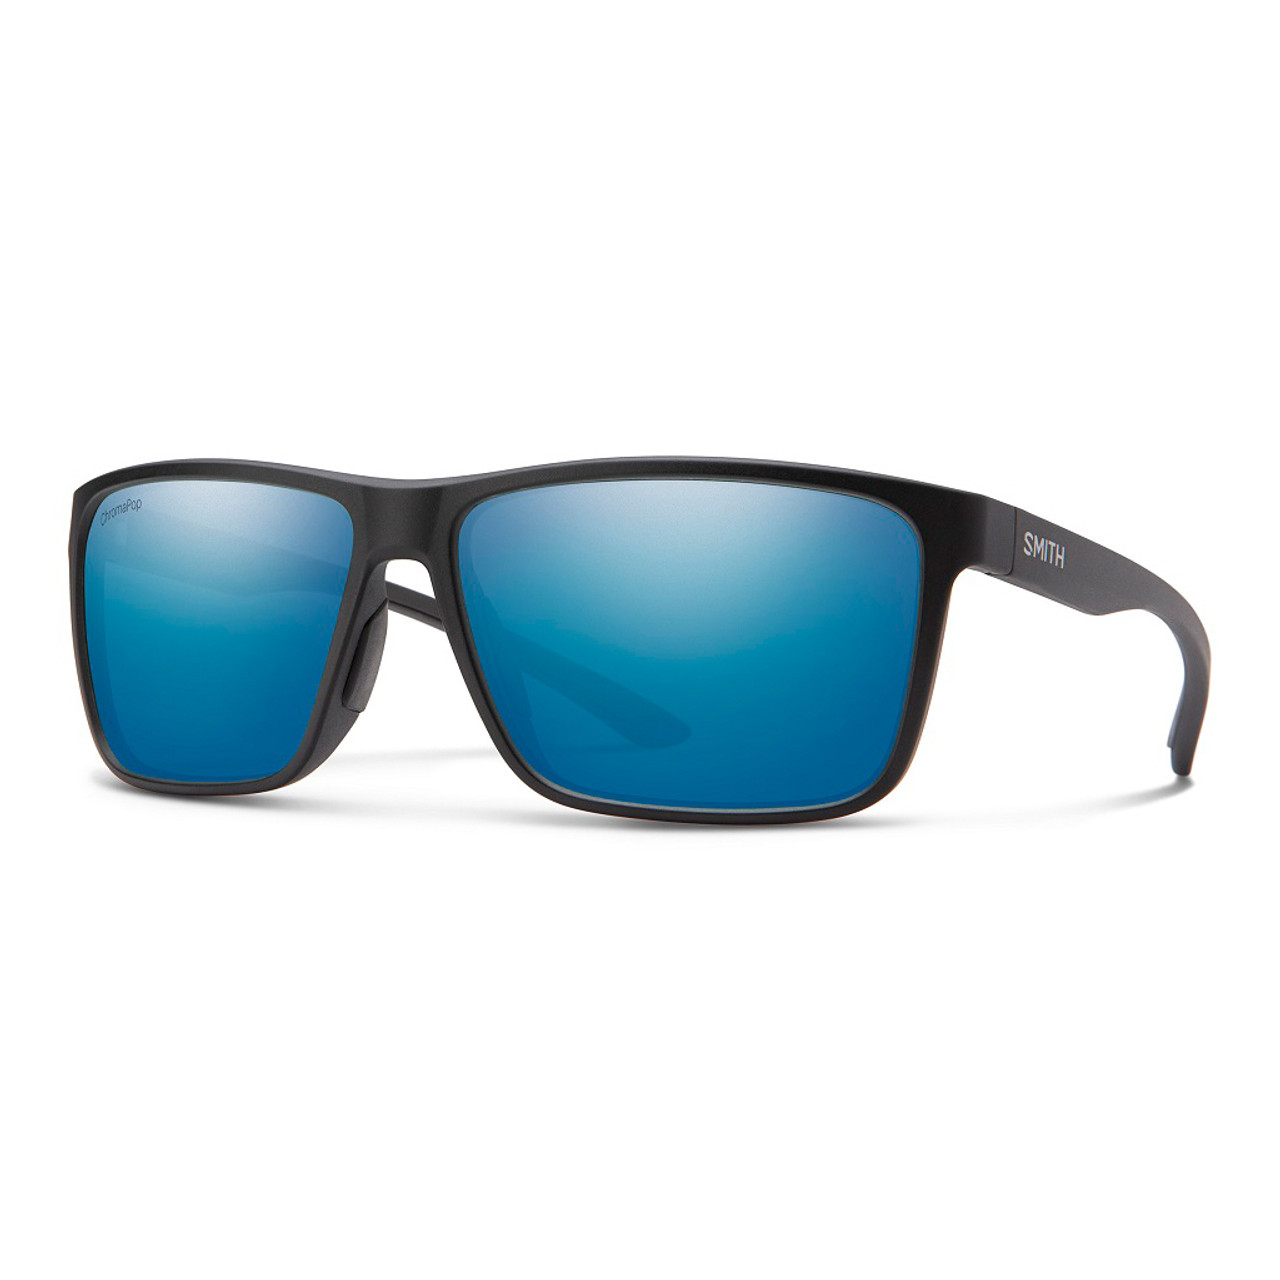 Matte Black w/ ChromaPop Glass Polarized Blue Mirror - Smith Riptide Sunglasses